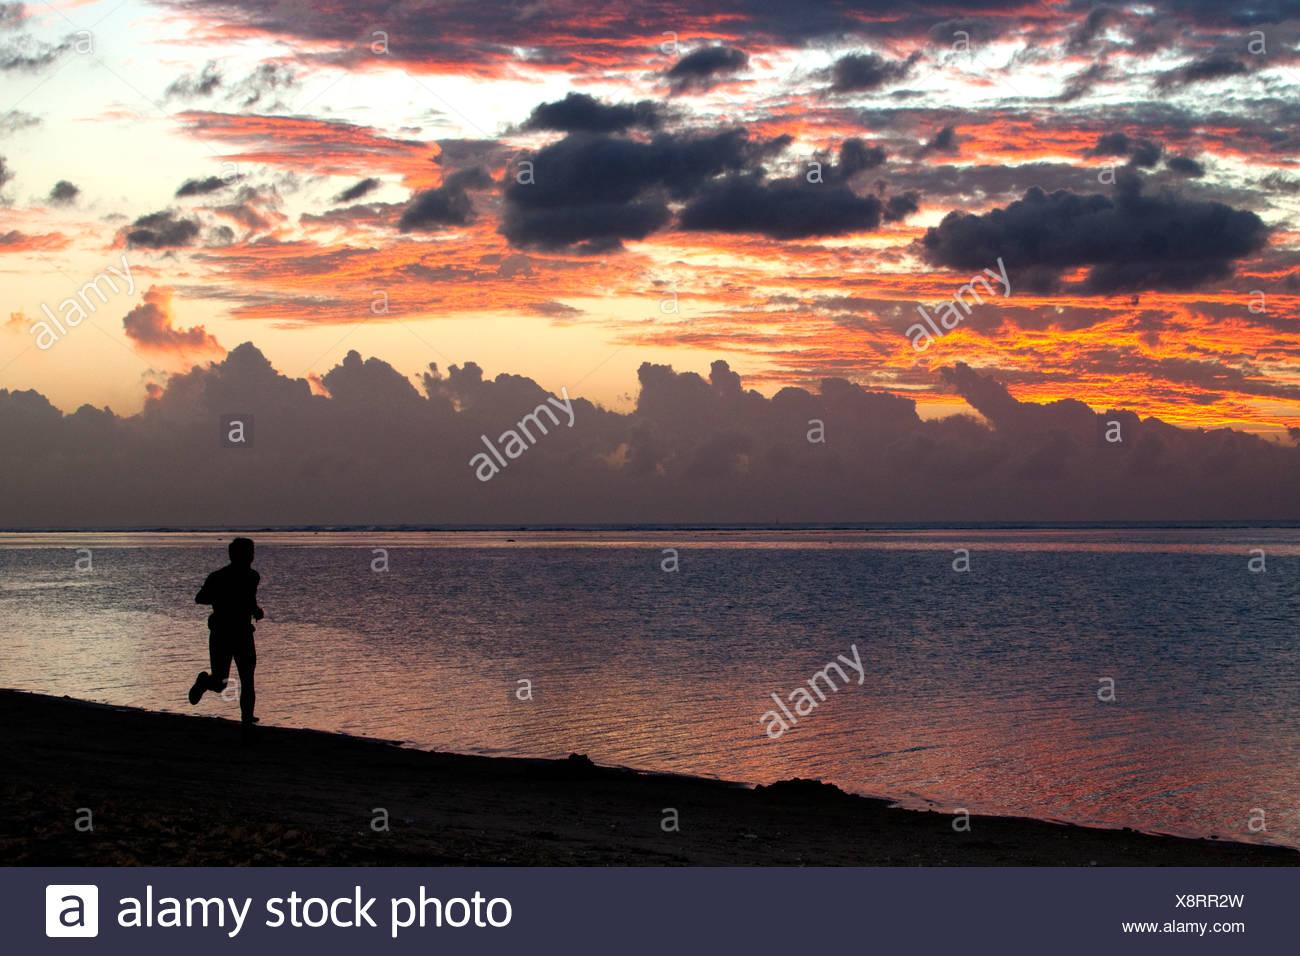 Man jogging at sunset on the beach of Saline-les-Bains, La Reunion island, Indian Ocean - Stock Image